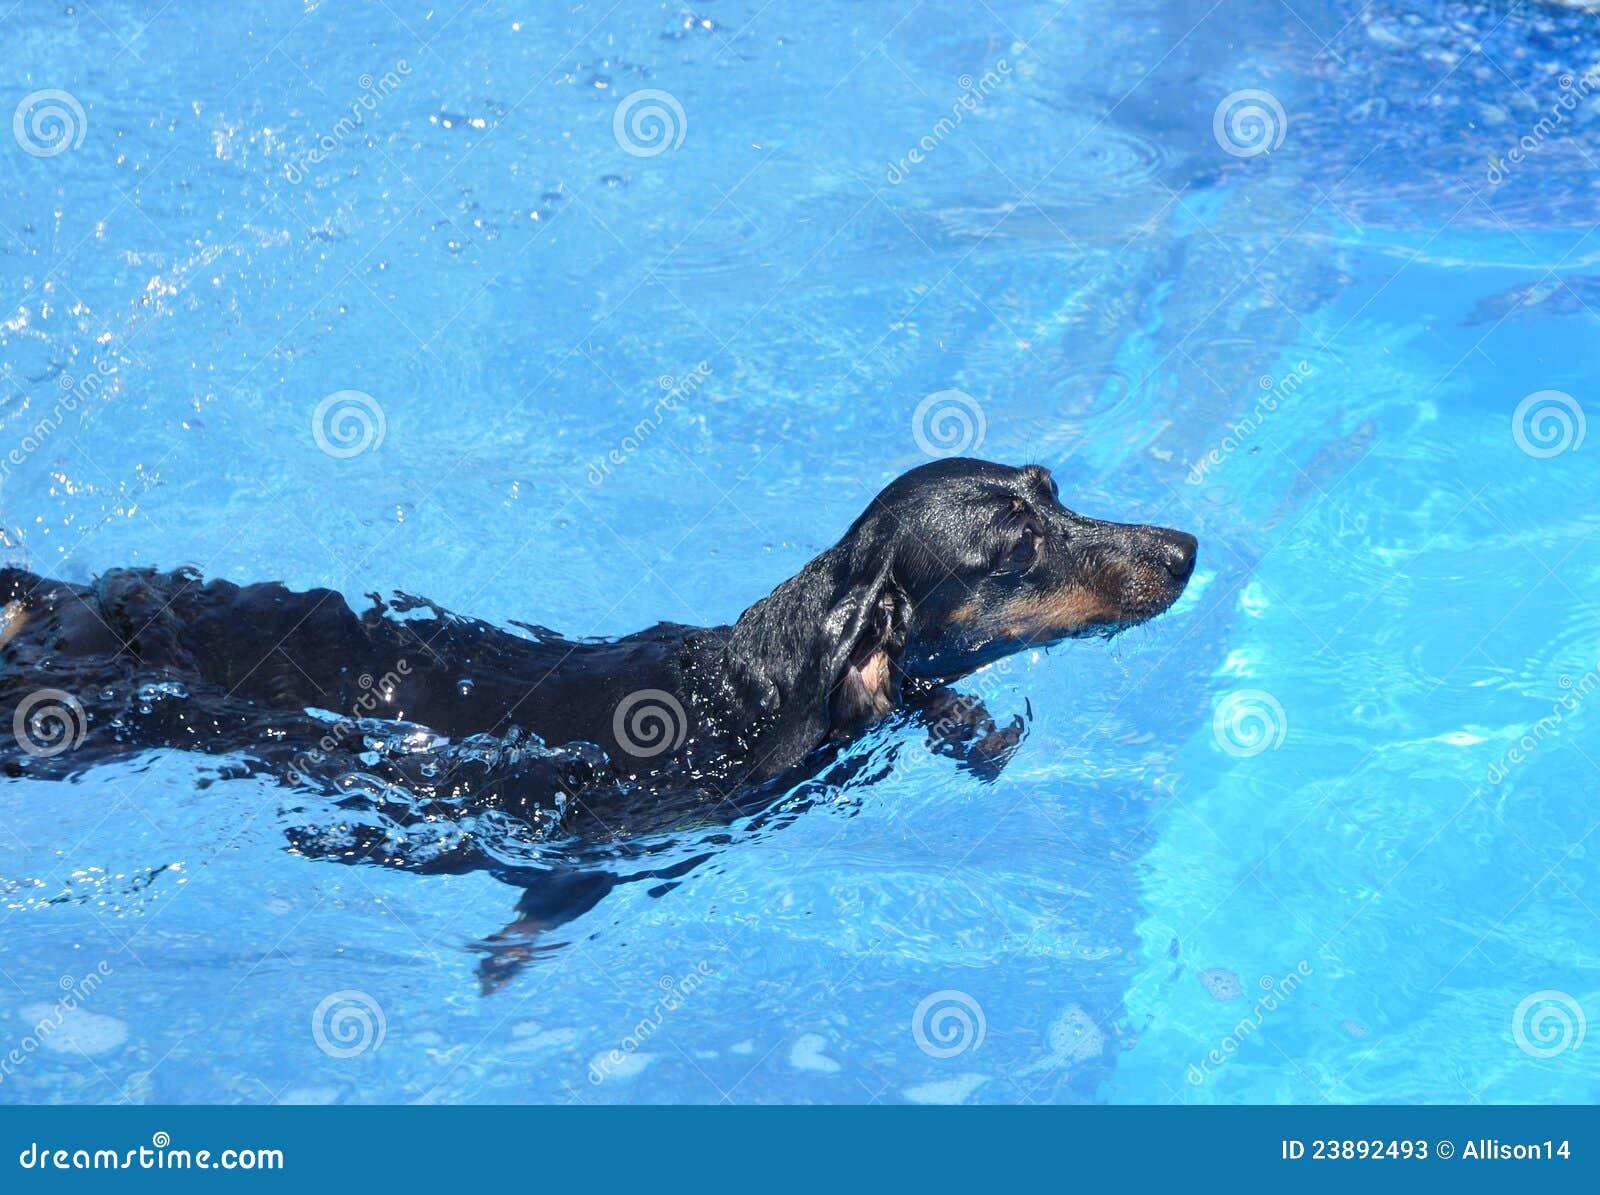 Black dachshund swimming stock photos image 23892493 for Swimming pools drank instrumental